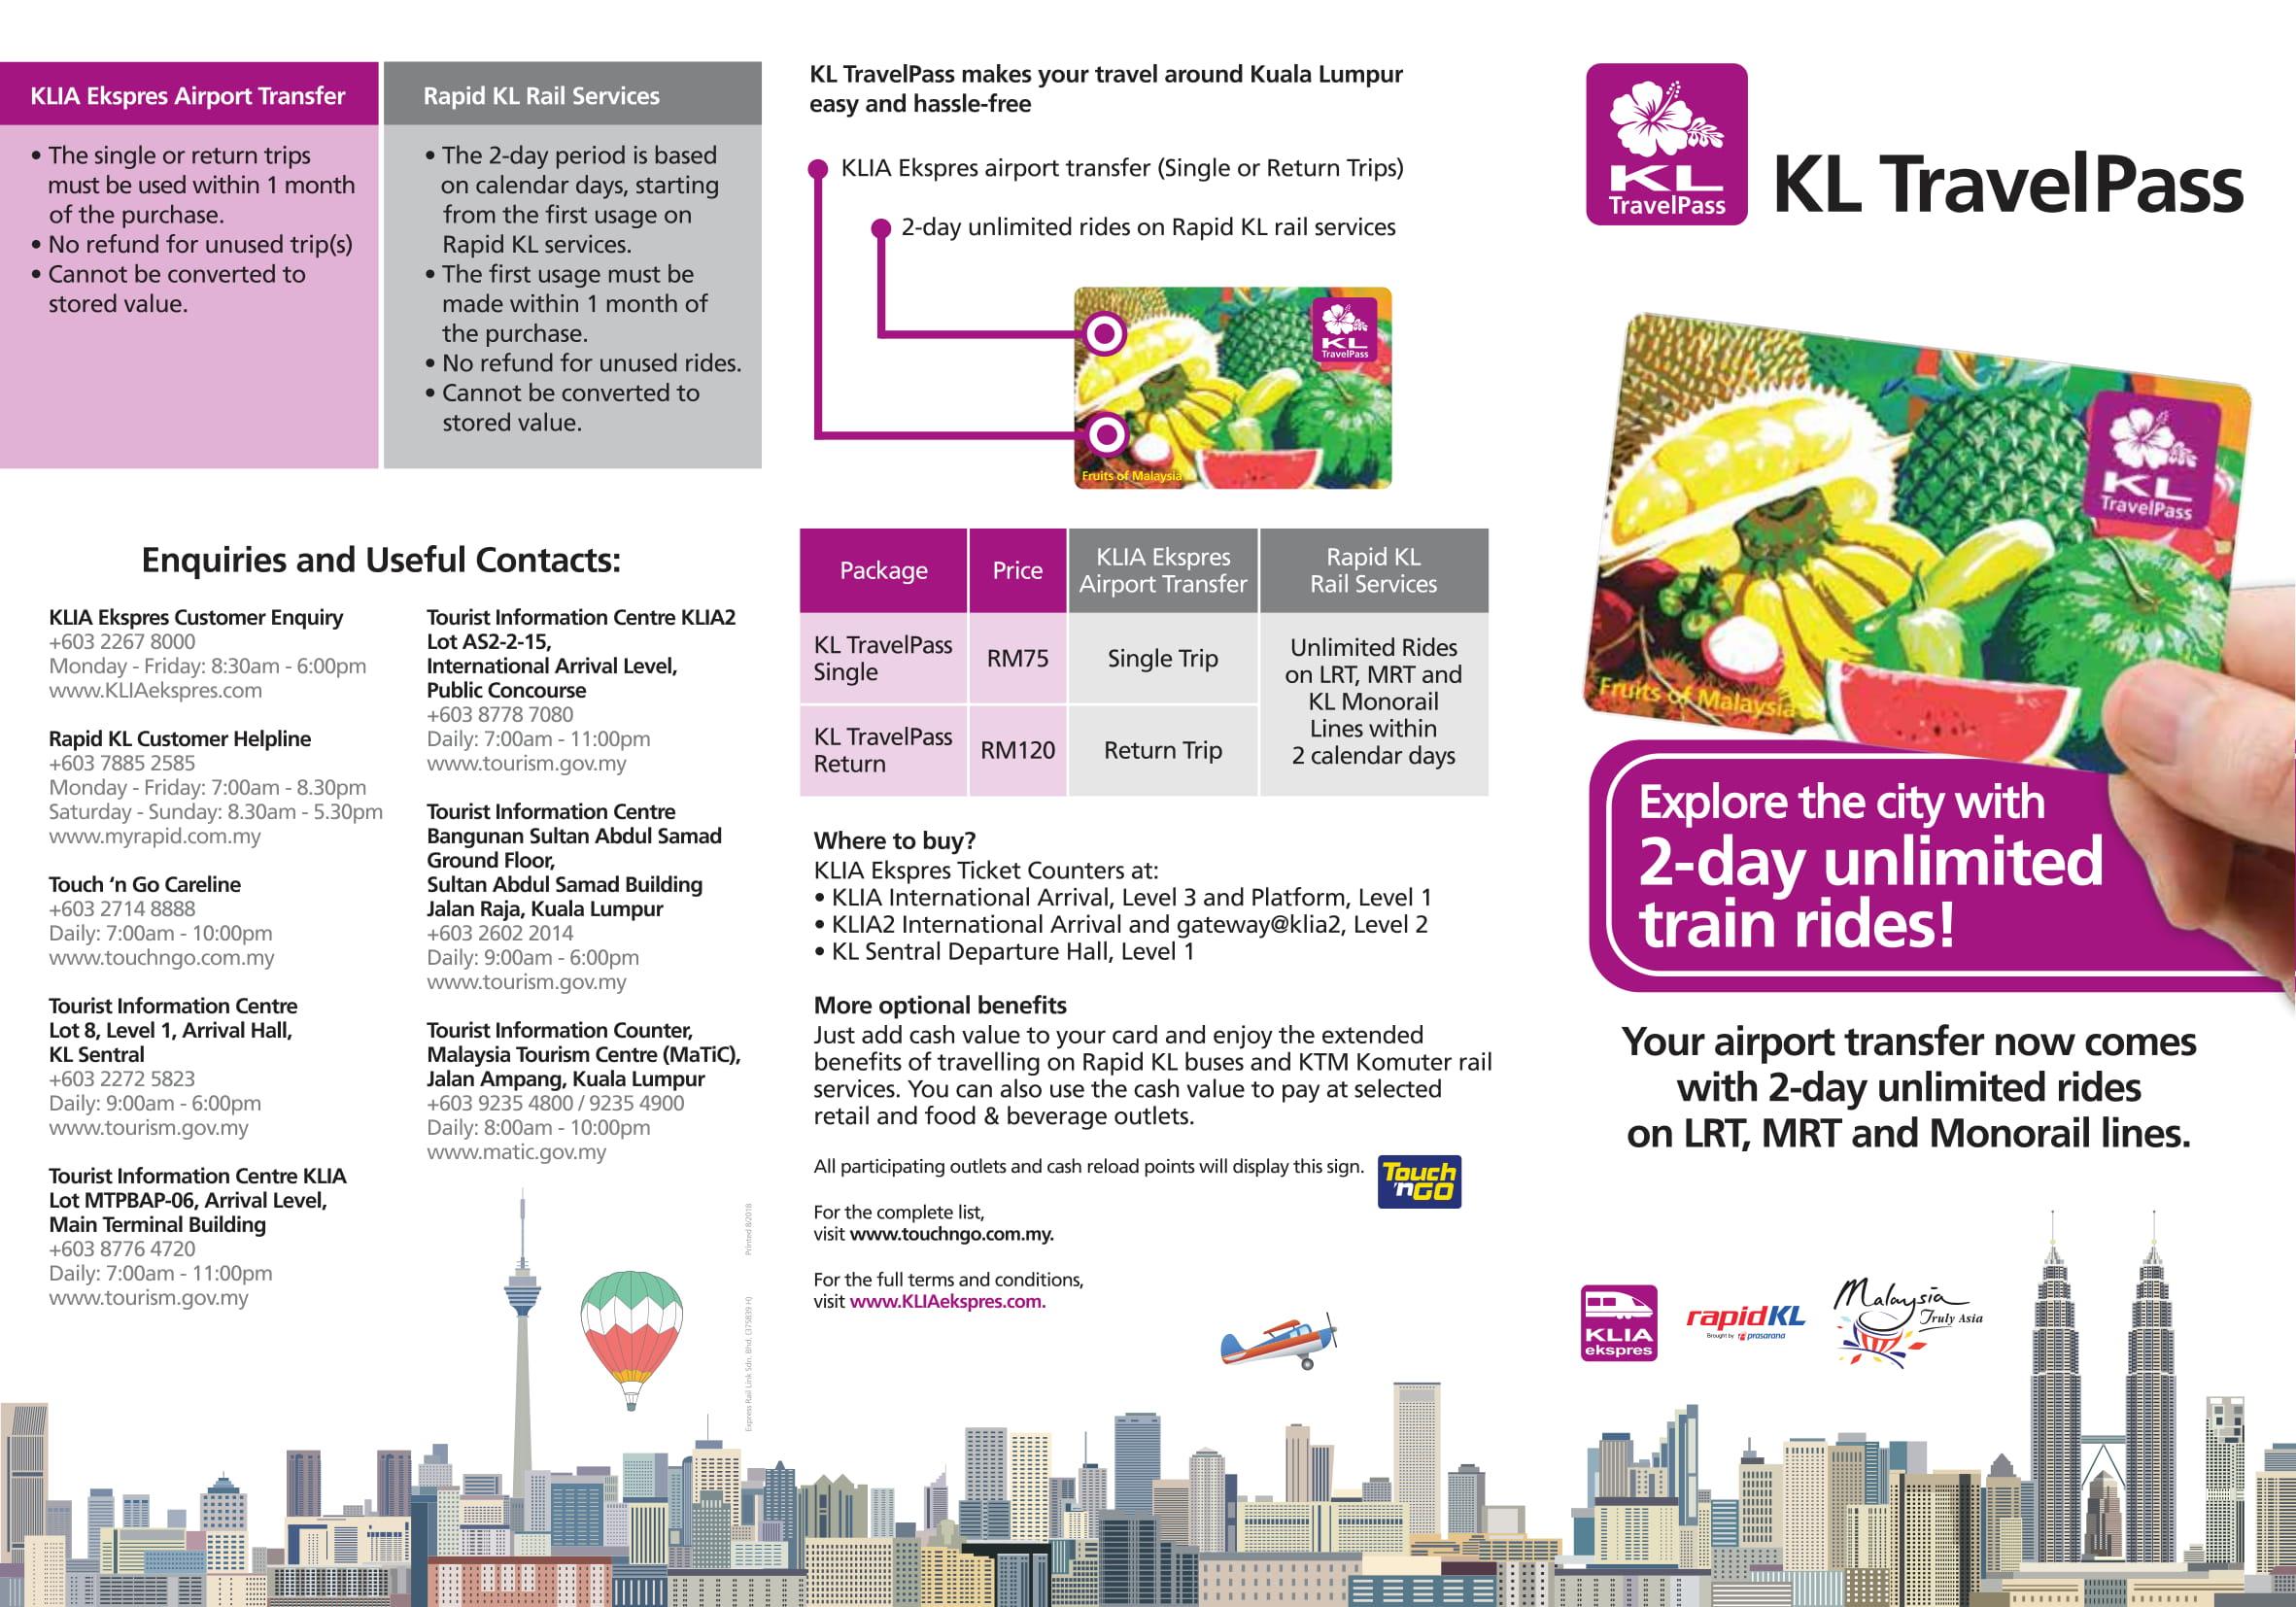 KL TravelPass in Kuala Lumpur, Malaysia - Klook